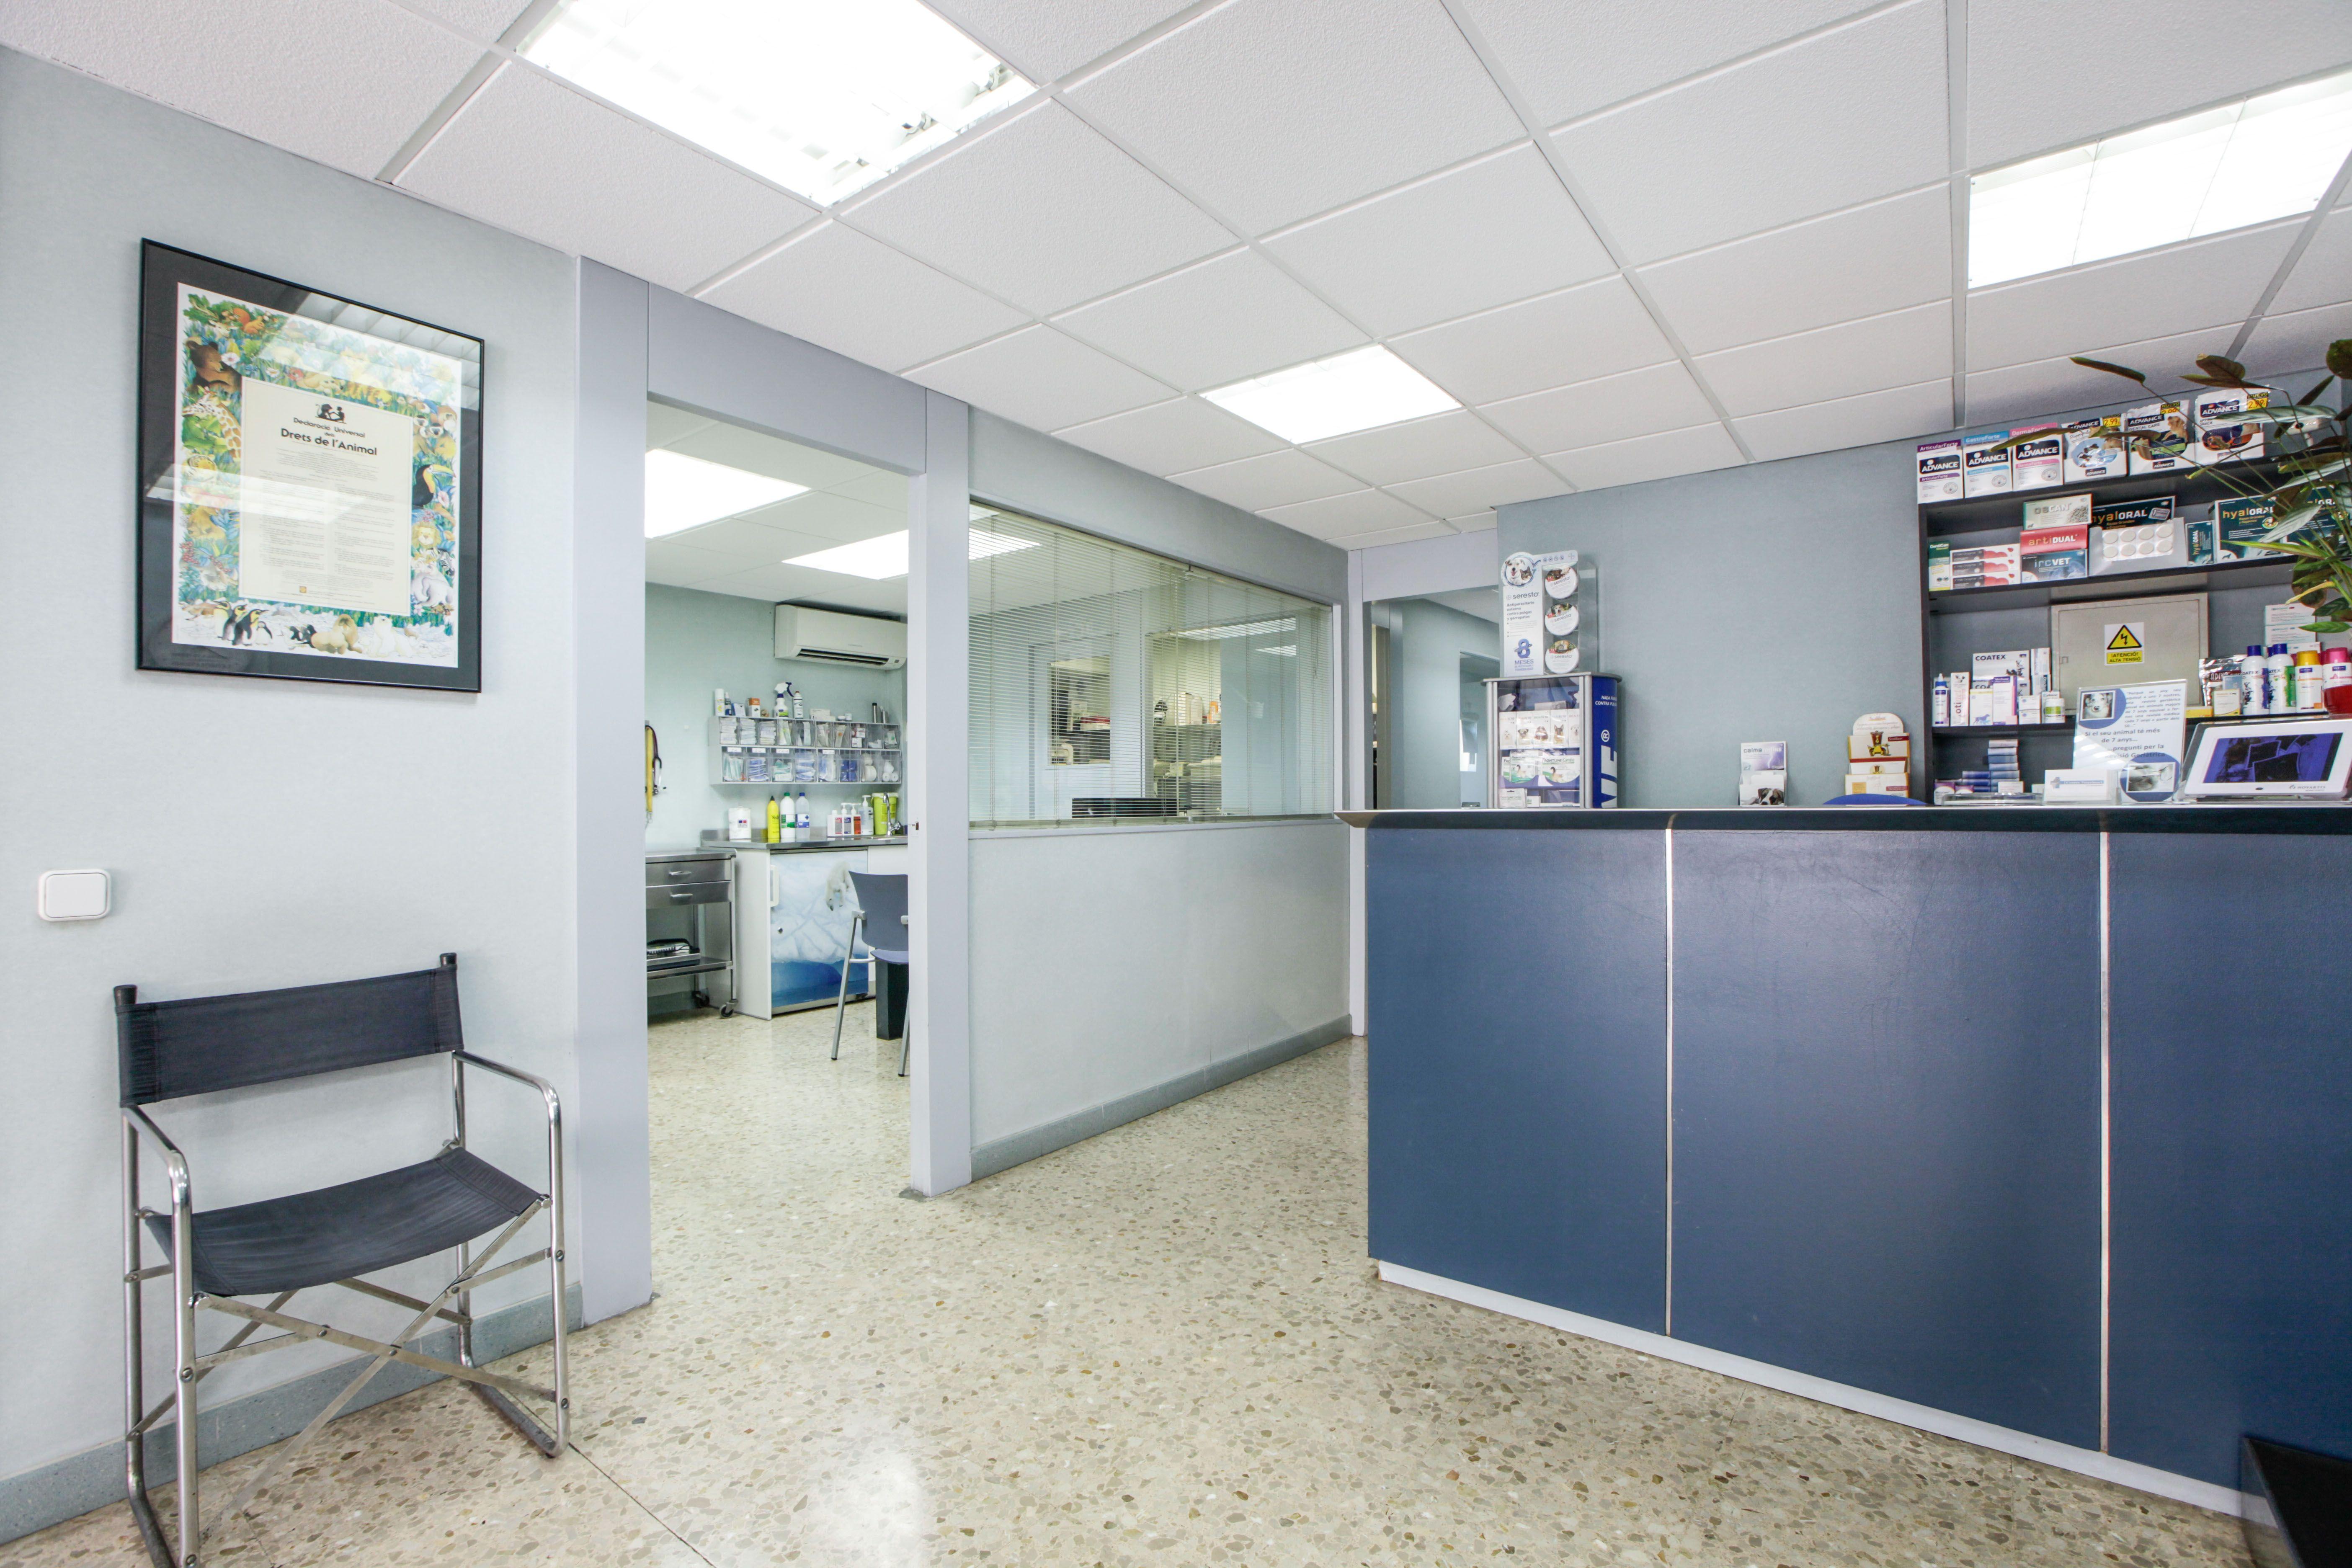 Foto 1 de Veterinarios en Sant Feliu de Llobregat | Centre Veterinari Lacueva Rodrigo